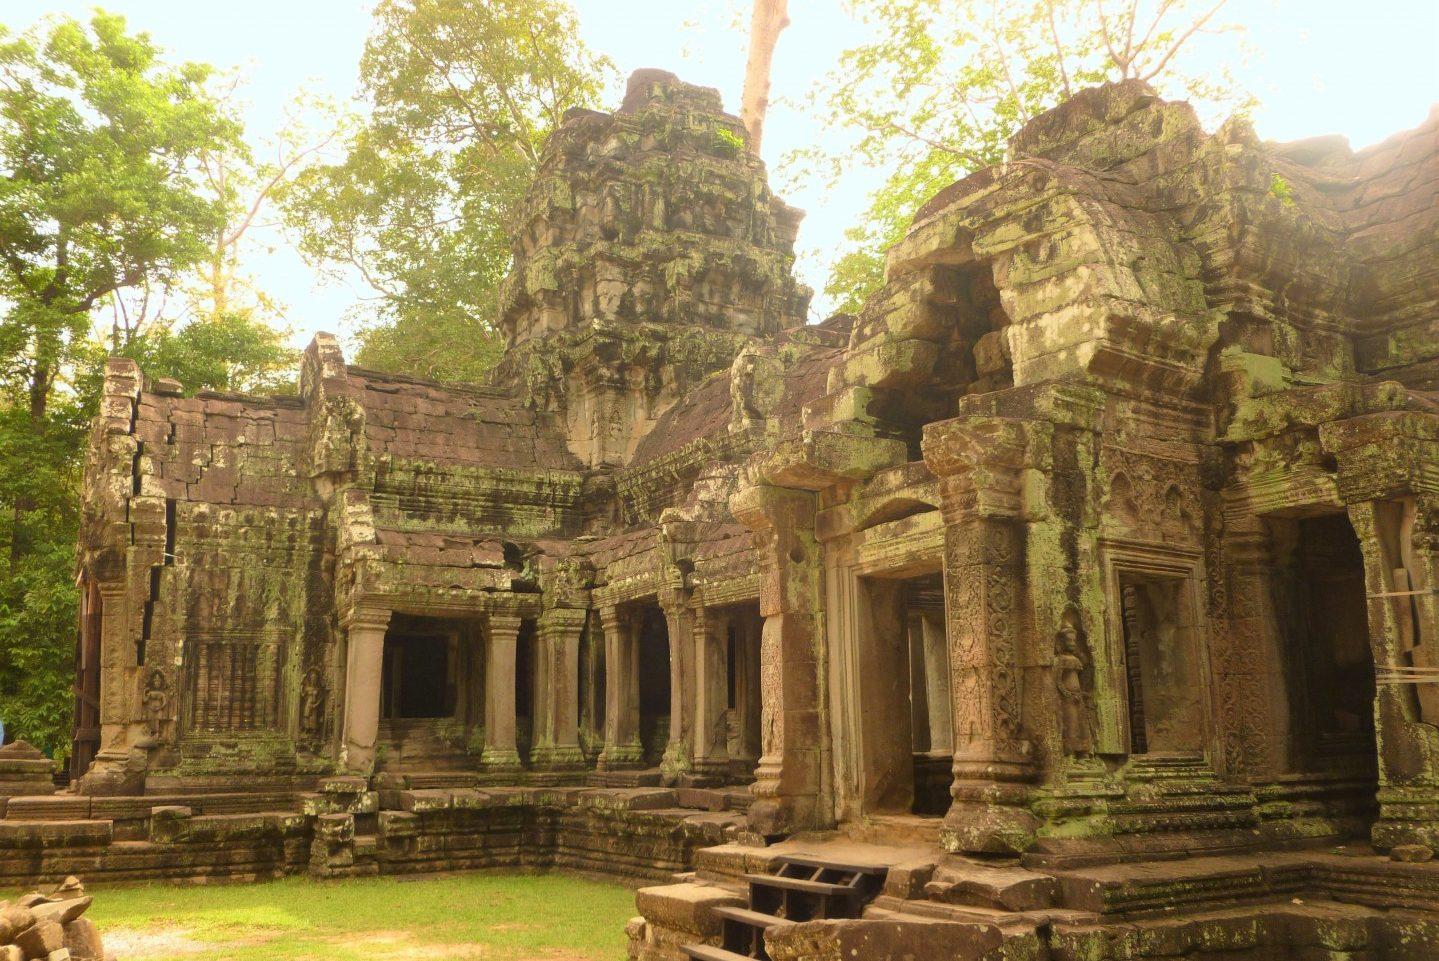 Cambodia, Angkor Archaeological Park, Ta Phrom, Siem Reap, school trip, student travel, educational travel,